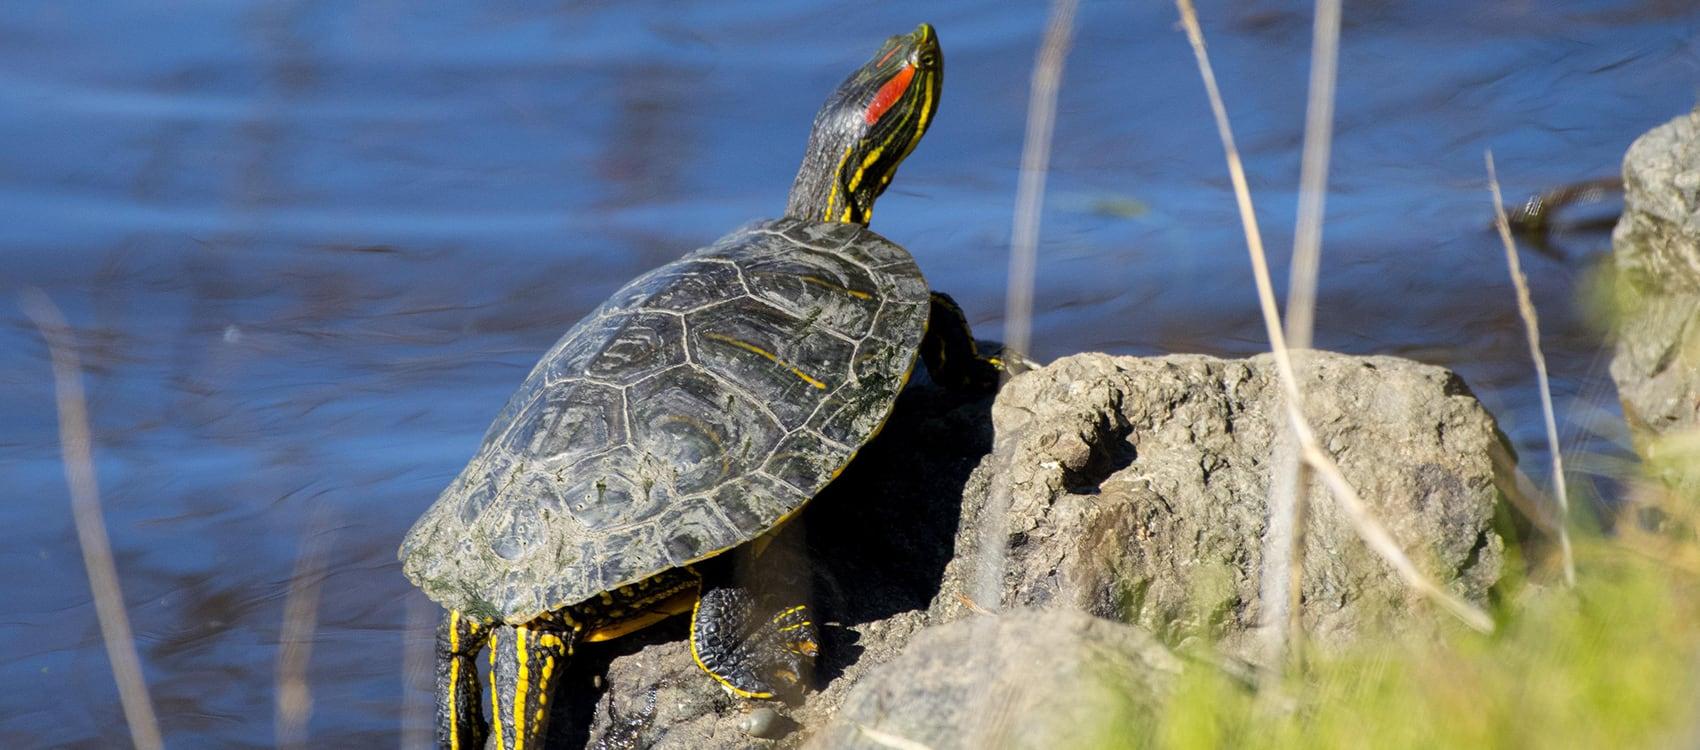 Stories Red Eared Turtle Centennial Parklands